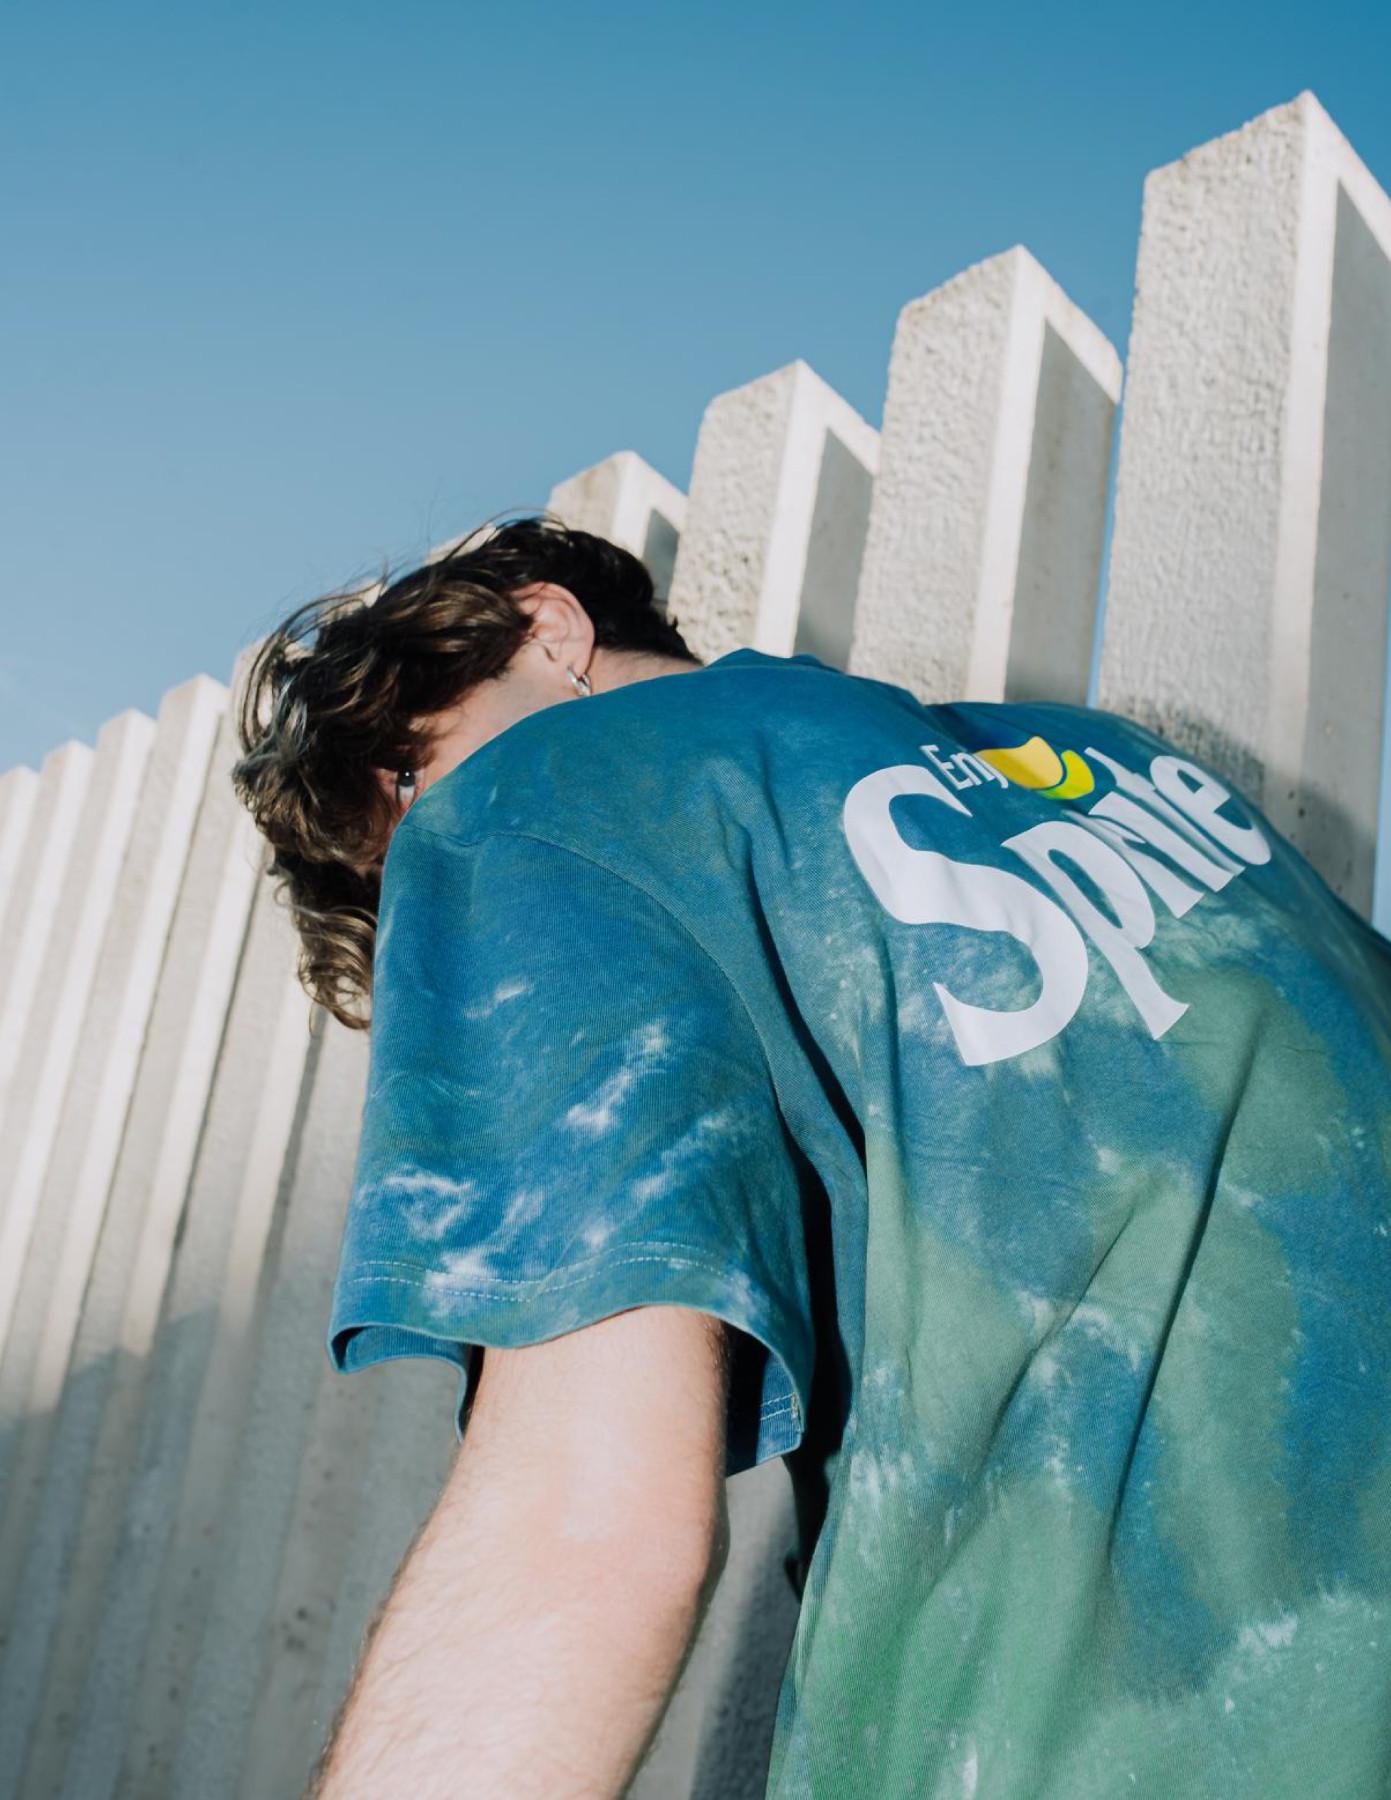 SNIPES x SPRITE tie-dye t-shirt